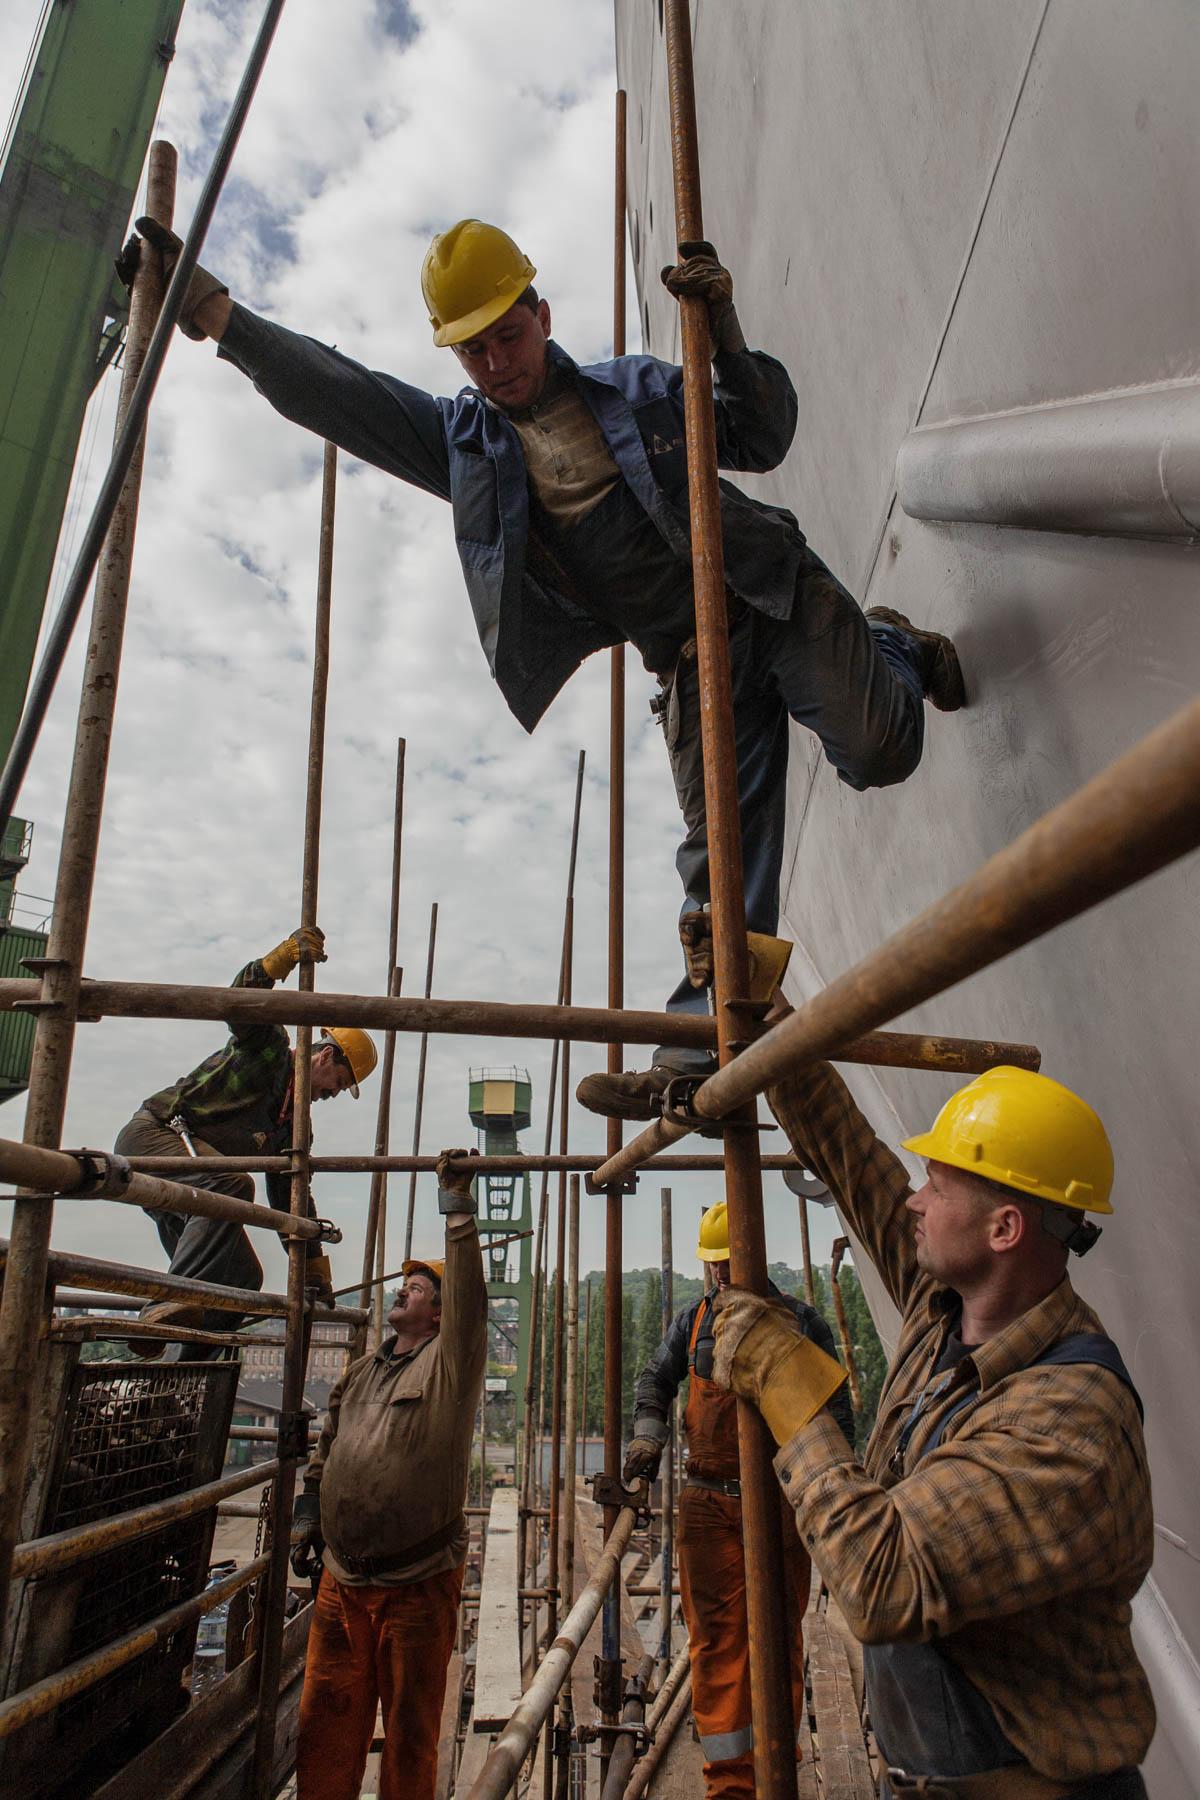 04-Gdansk-Shipyard_04_MG_2712_p-Mikolaj-Nowacki